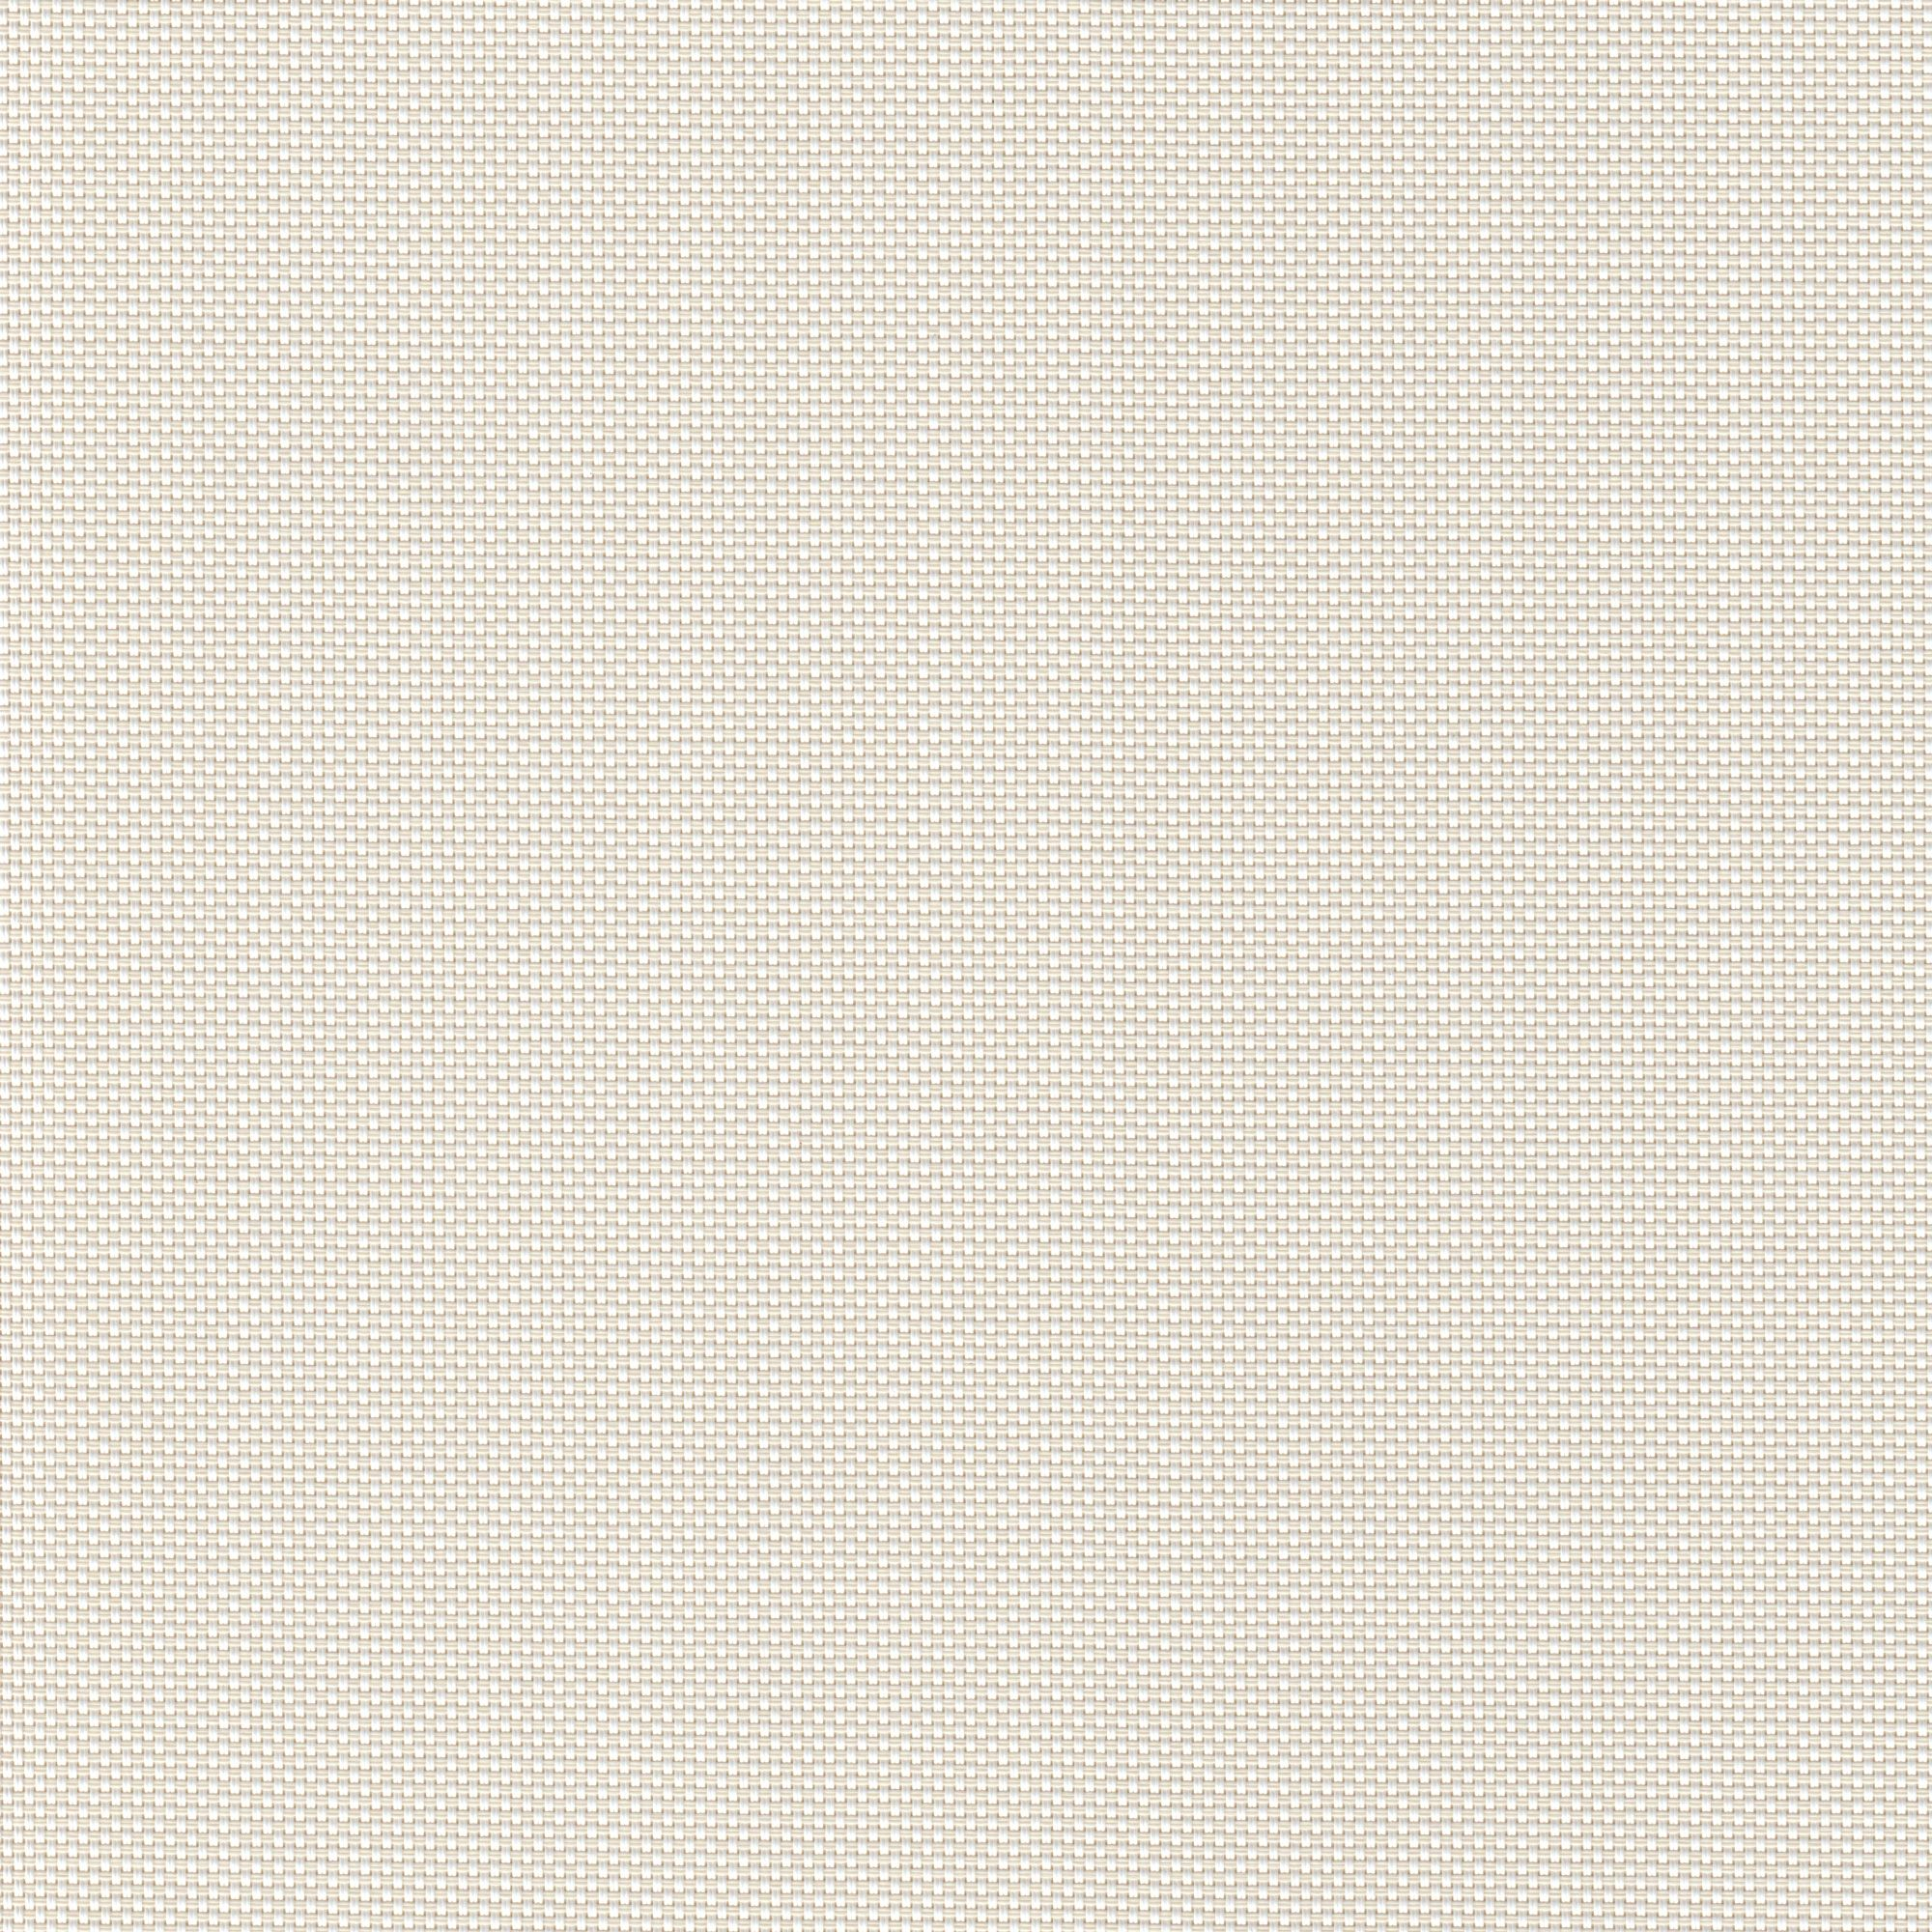 Nordic Screen BW White-Linen